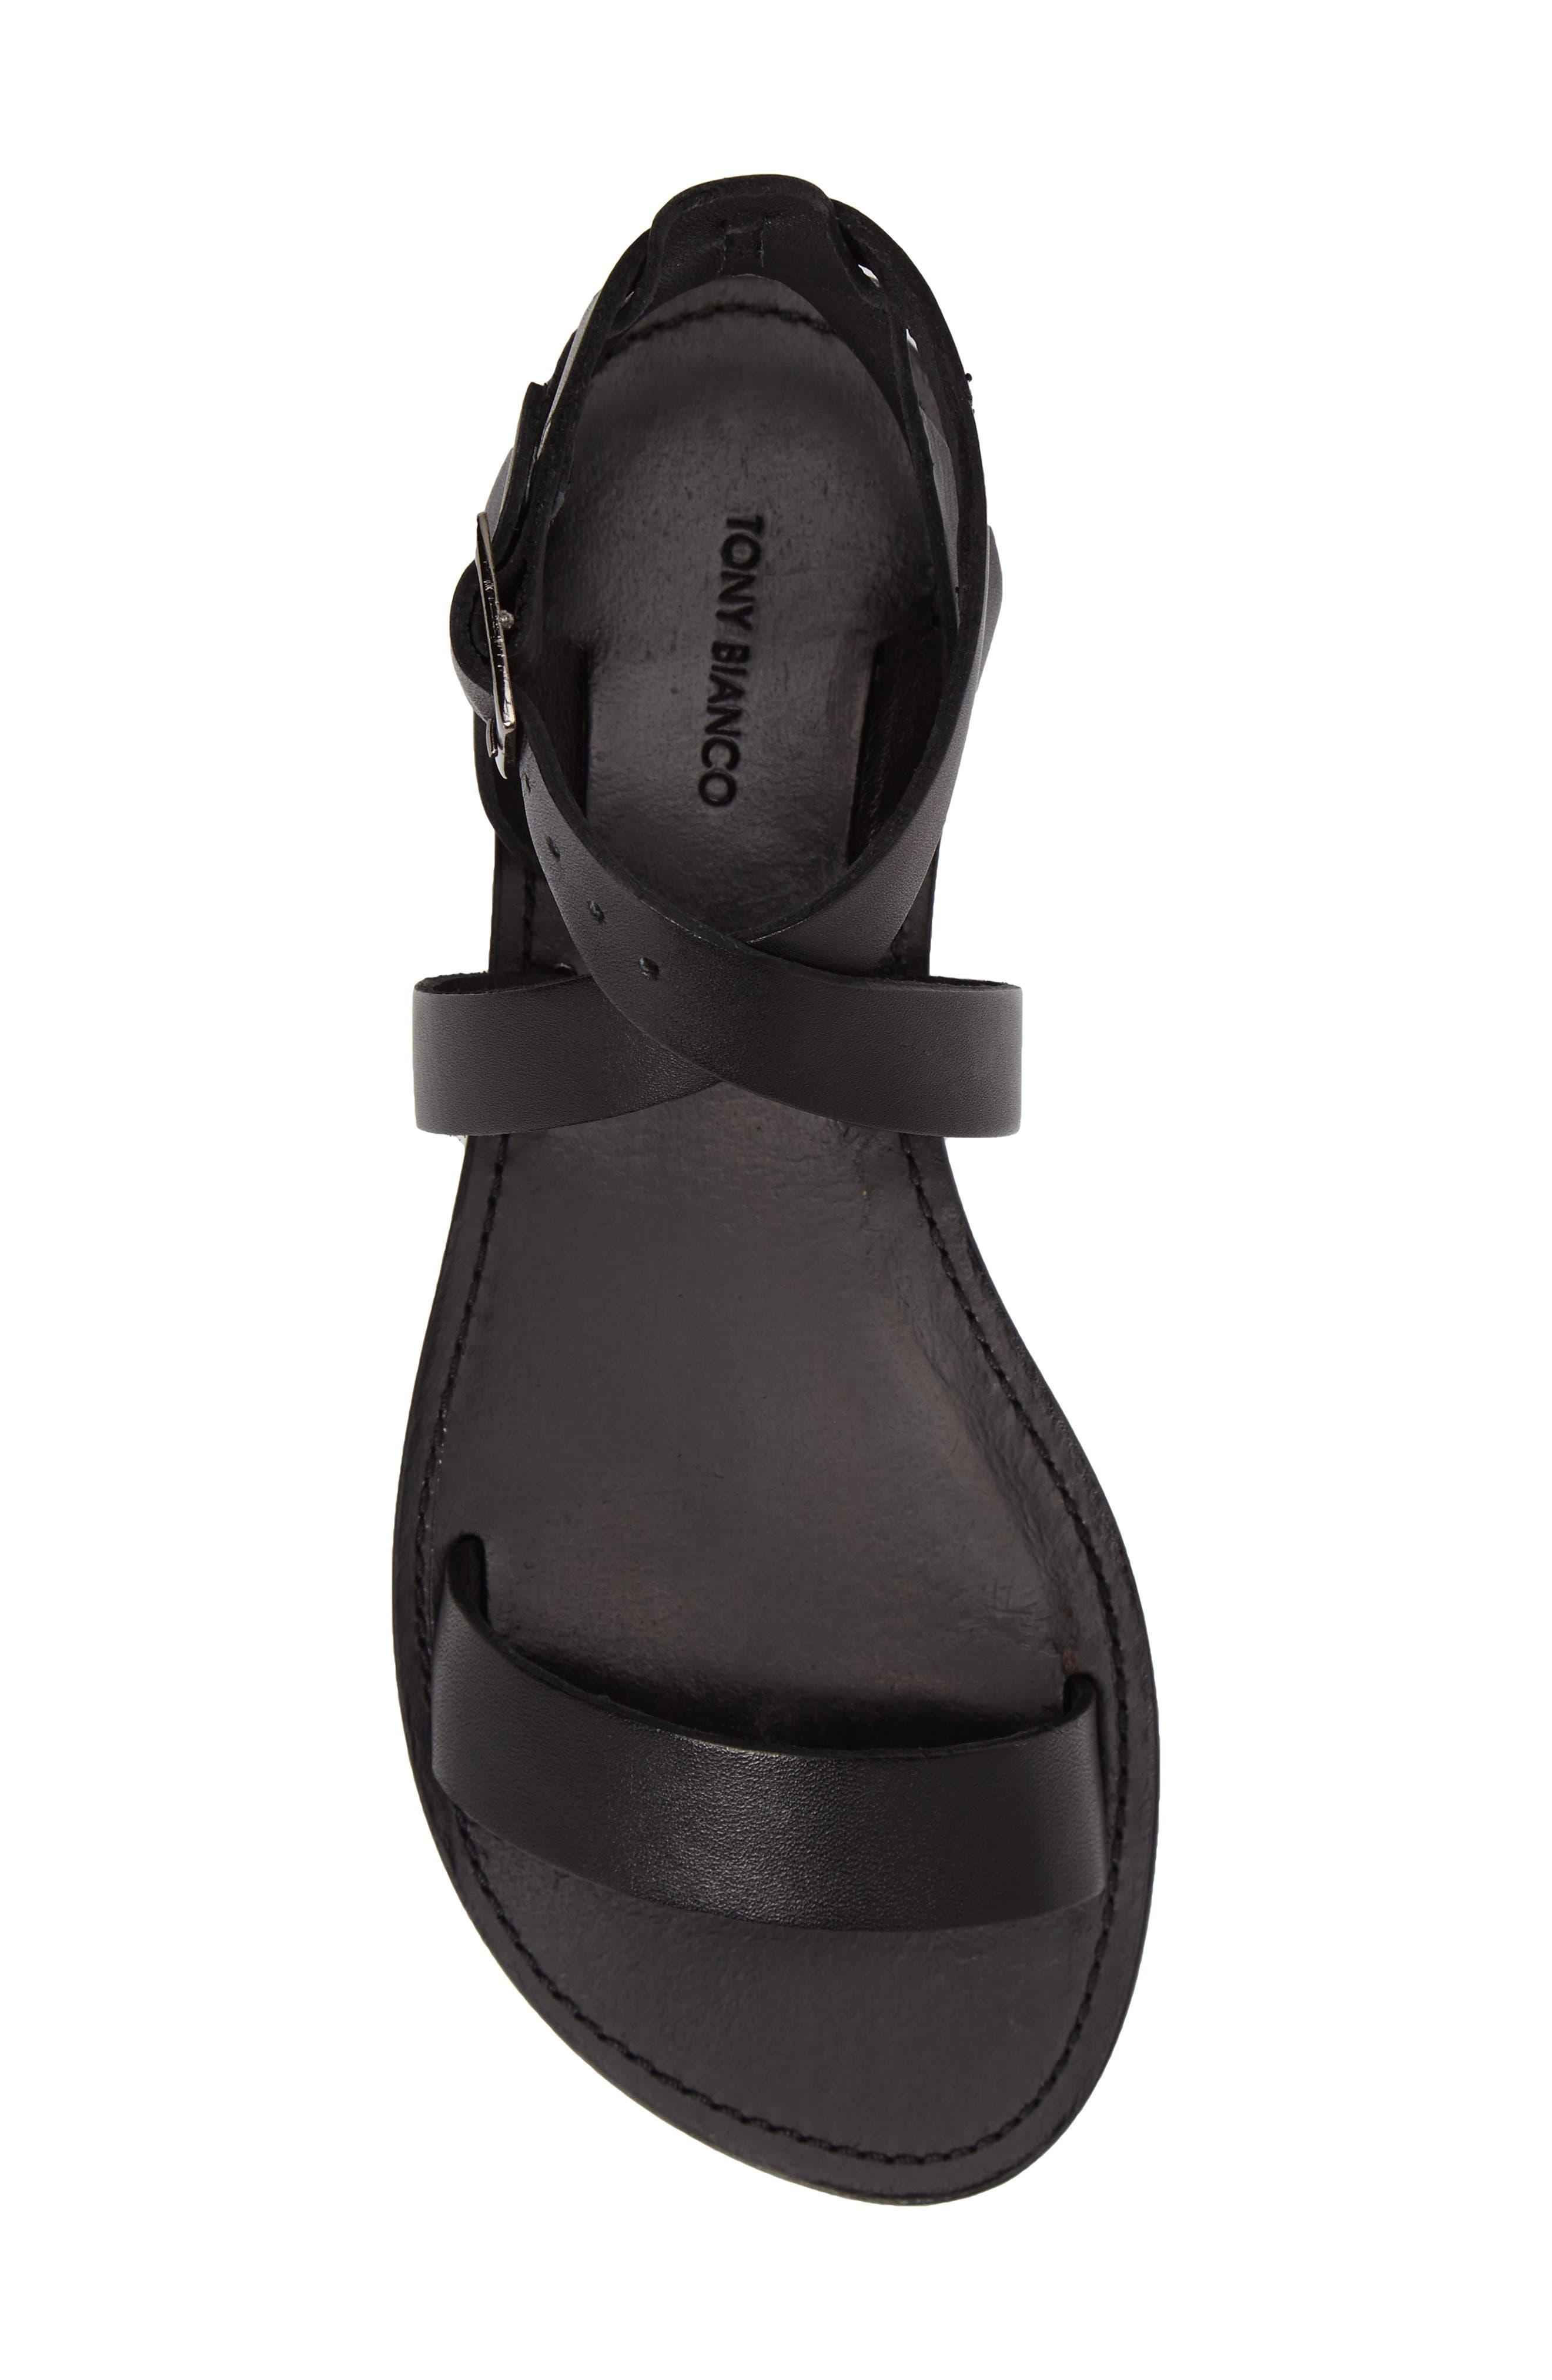 Flo Ankle Strap Sandal,                             Alternate thumbnail 5, color,                             001